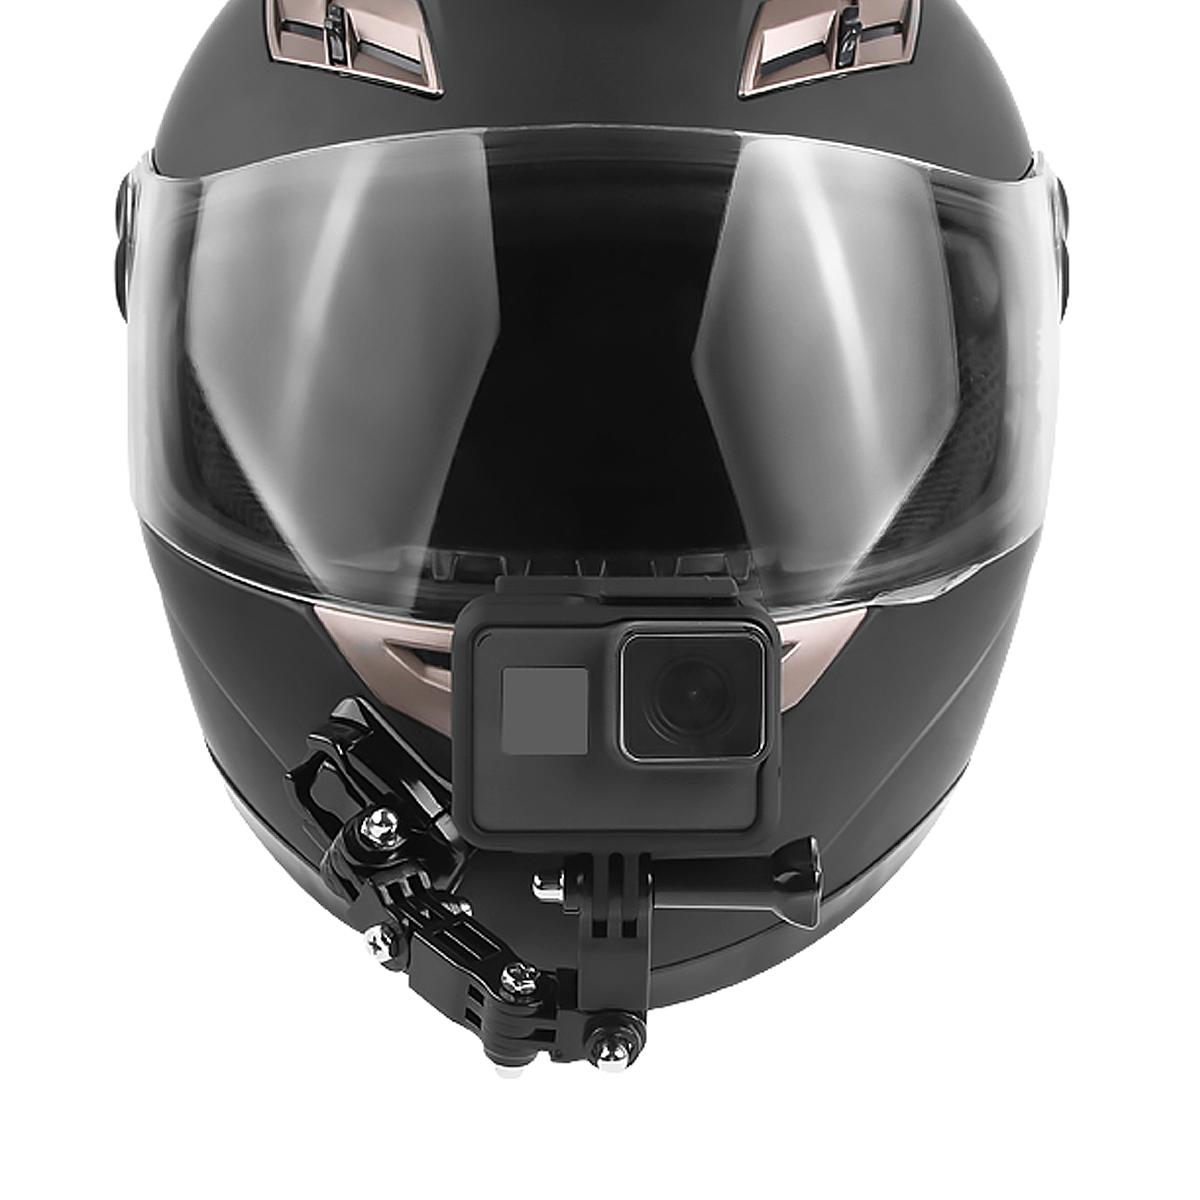 Adhesive Full Face Helm Front Kinnhalter für Sjcam / Antshares / Gopro Hero 6 5 4 3 Aktion Kamera